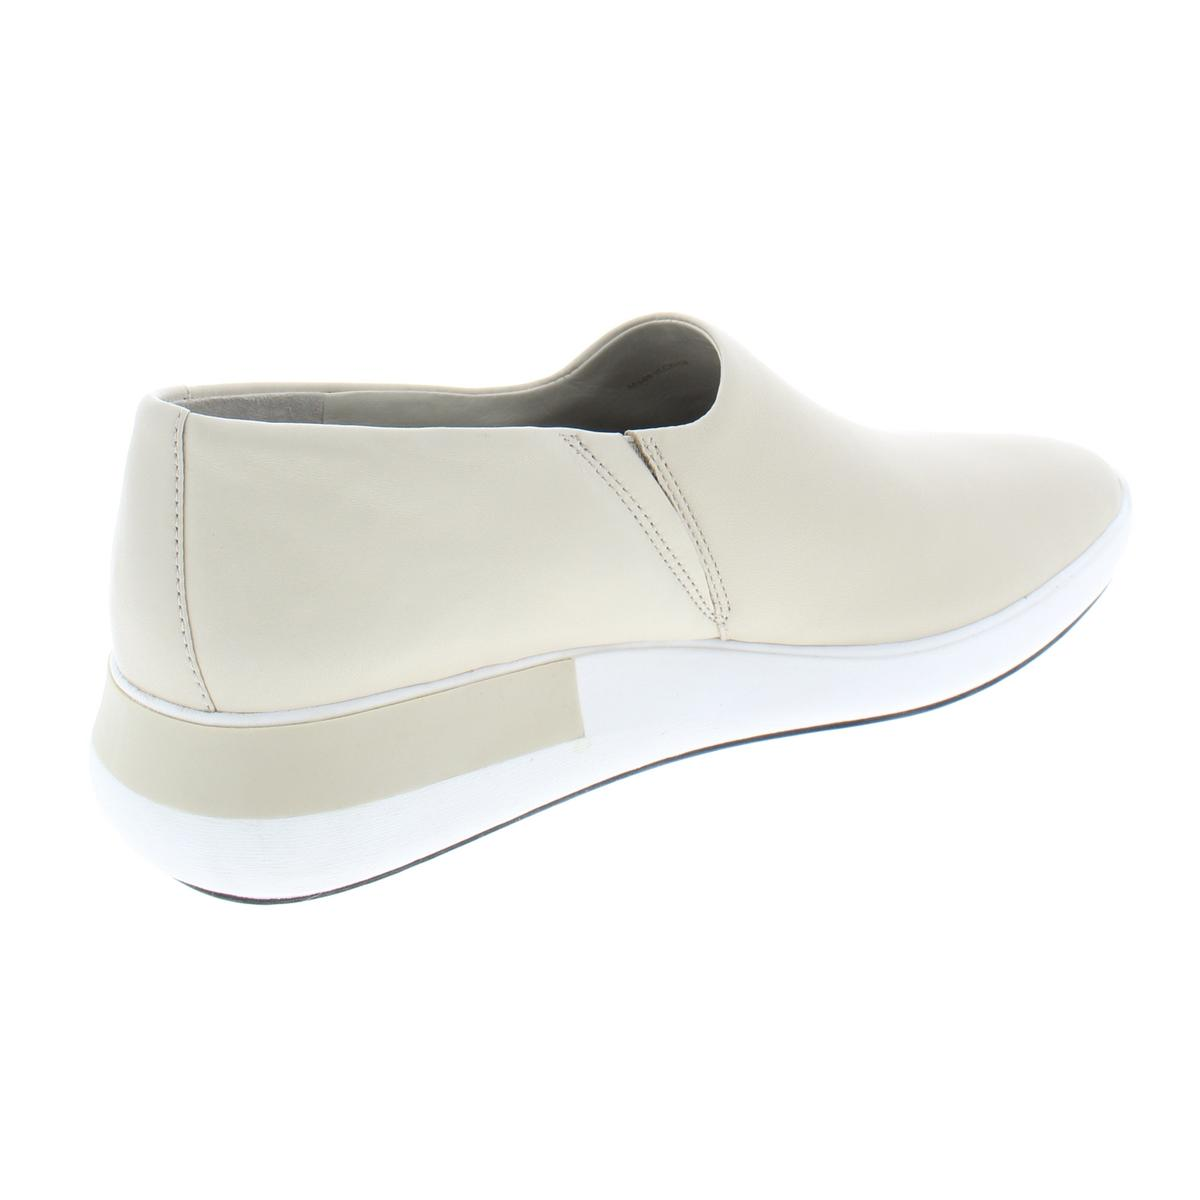 Via-Spiga-Womens-Malena-Leather-Low-Top-Sneaker-Casual-Shoes-Flats-BHFO-9183 thumbnail 6